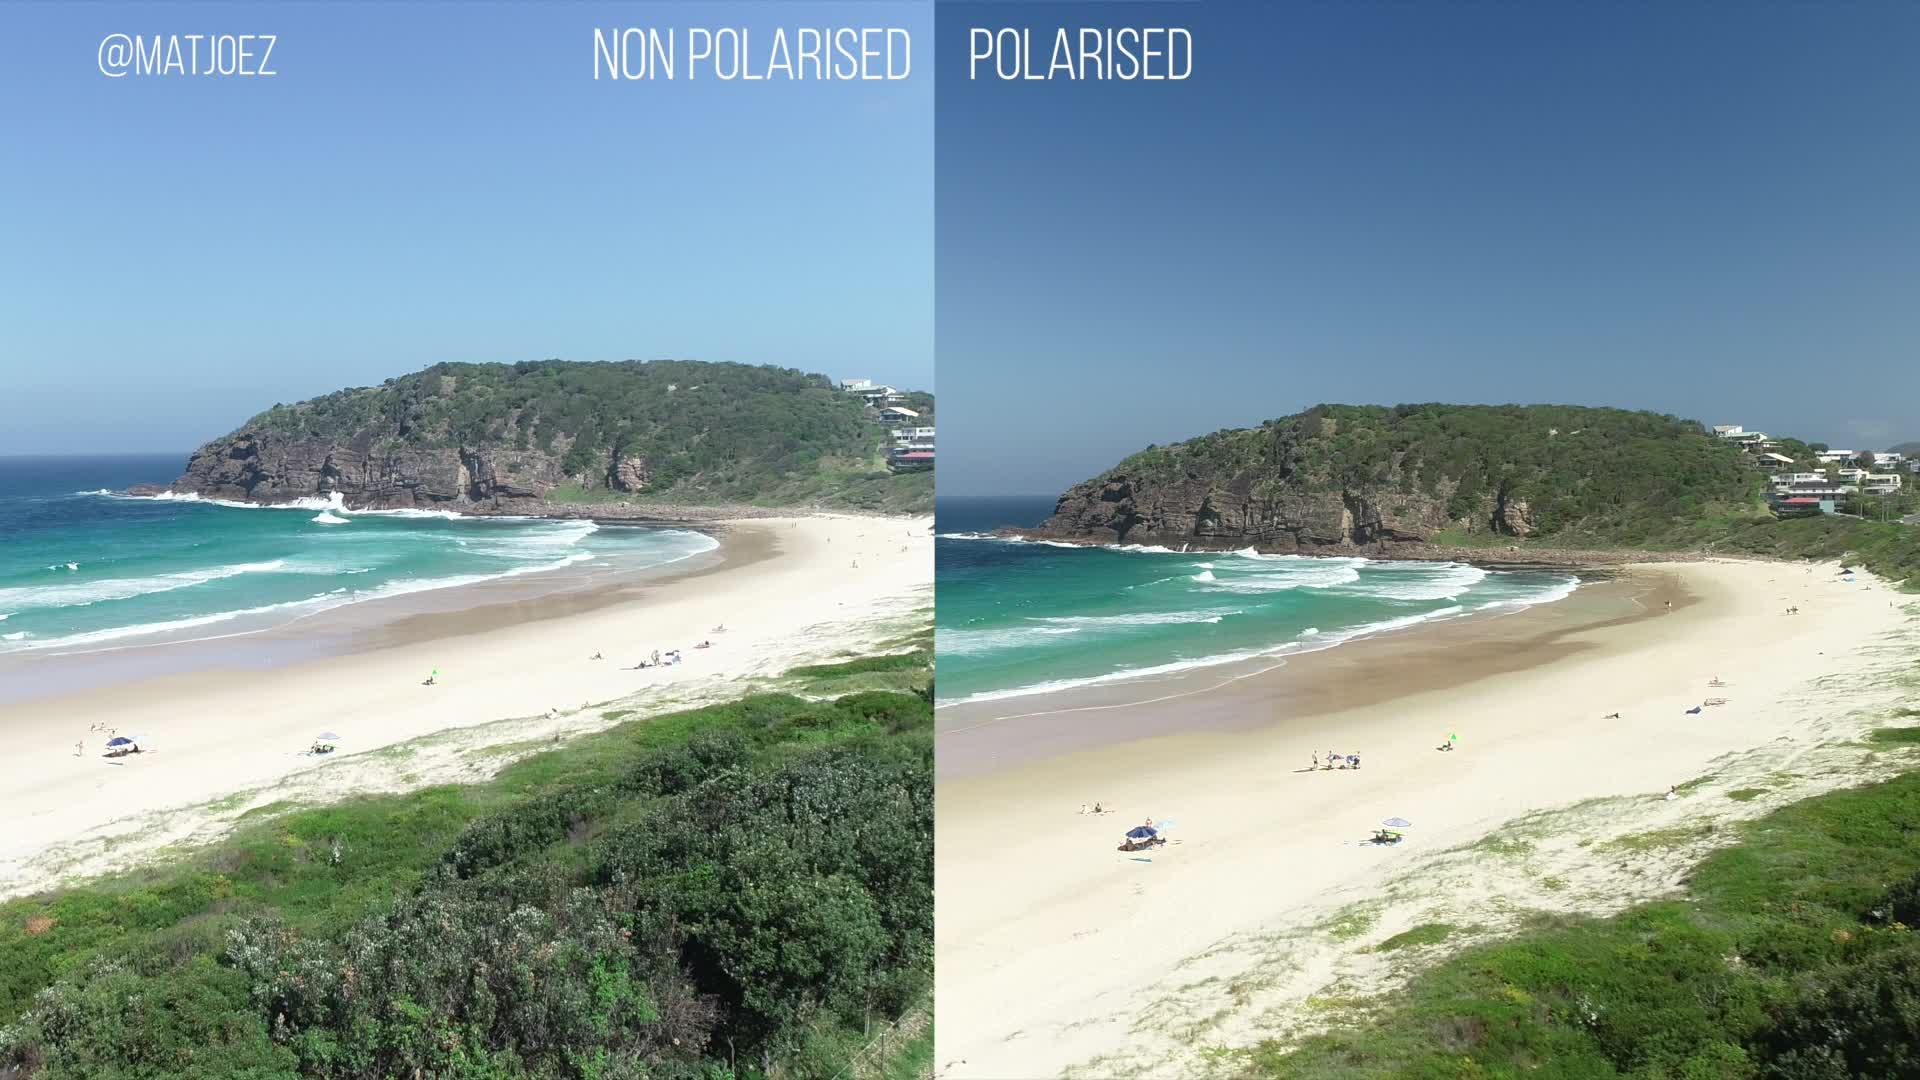 drone, drones, photography, Circular polariser on a drone comparison GIFs